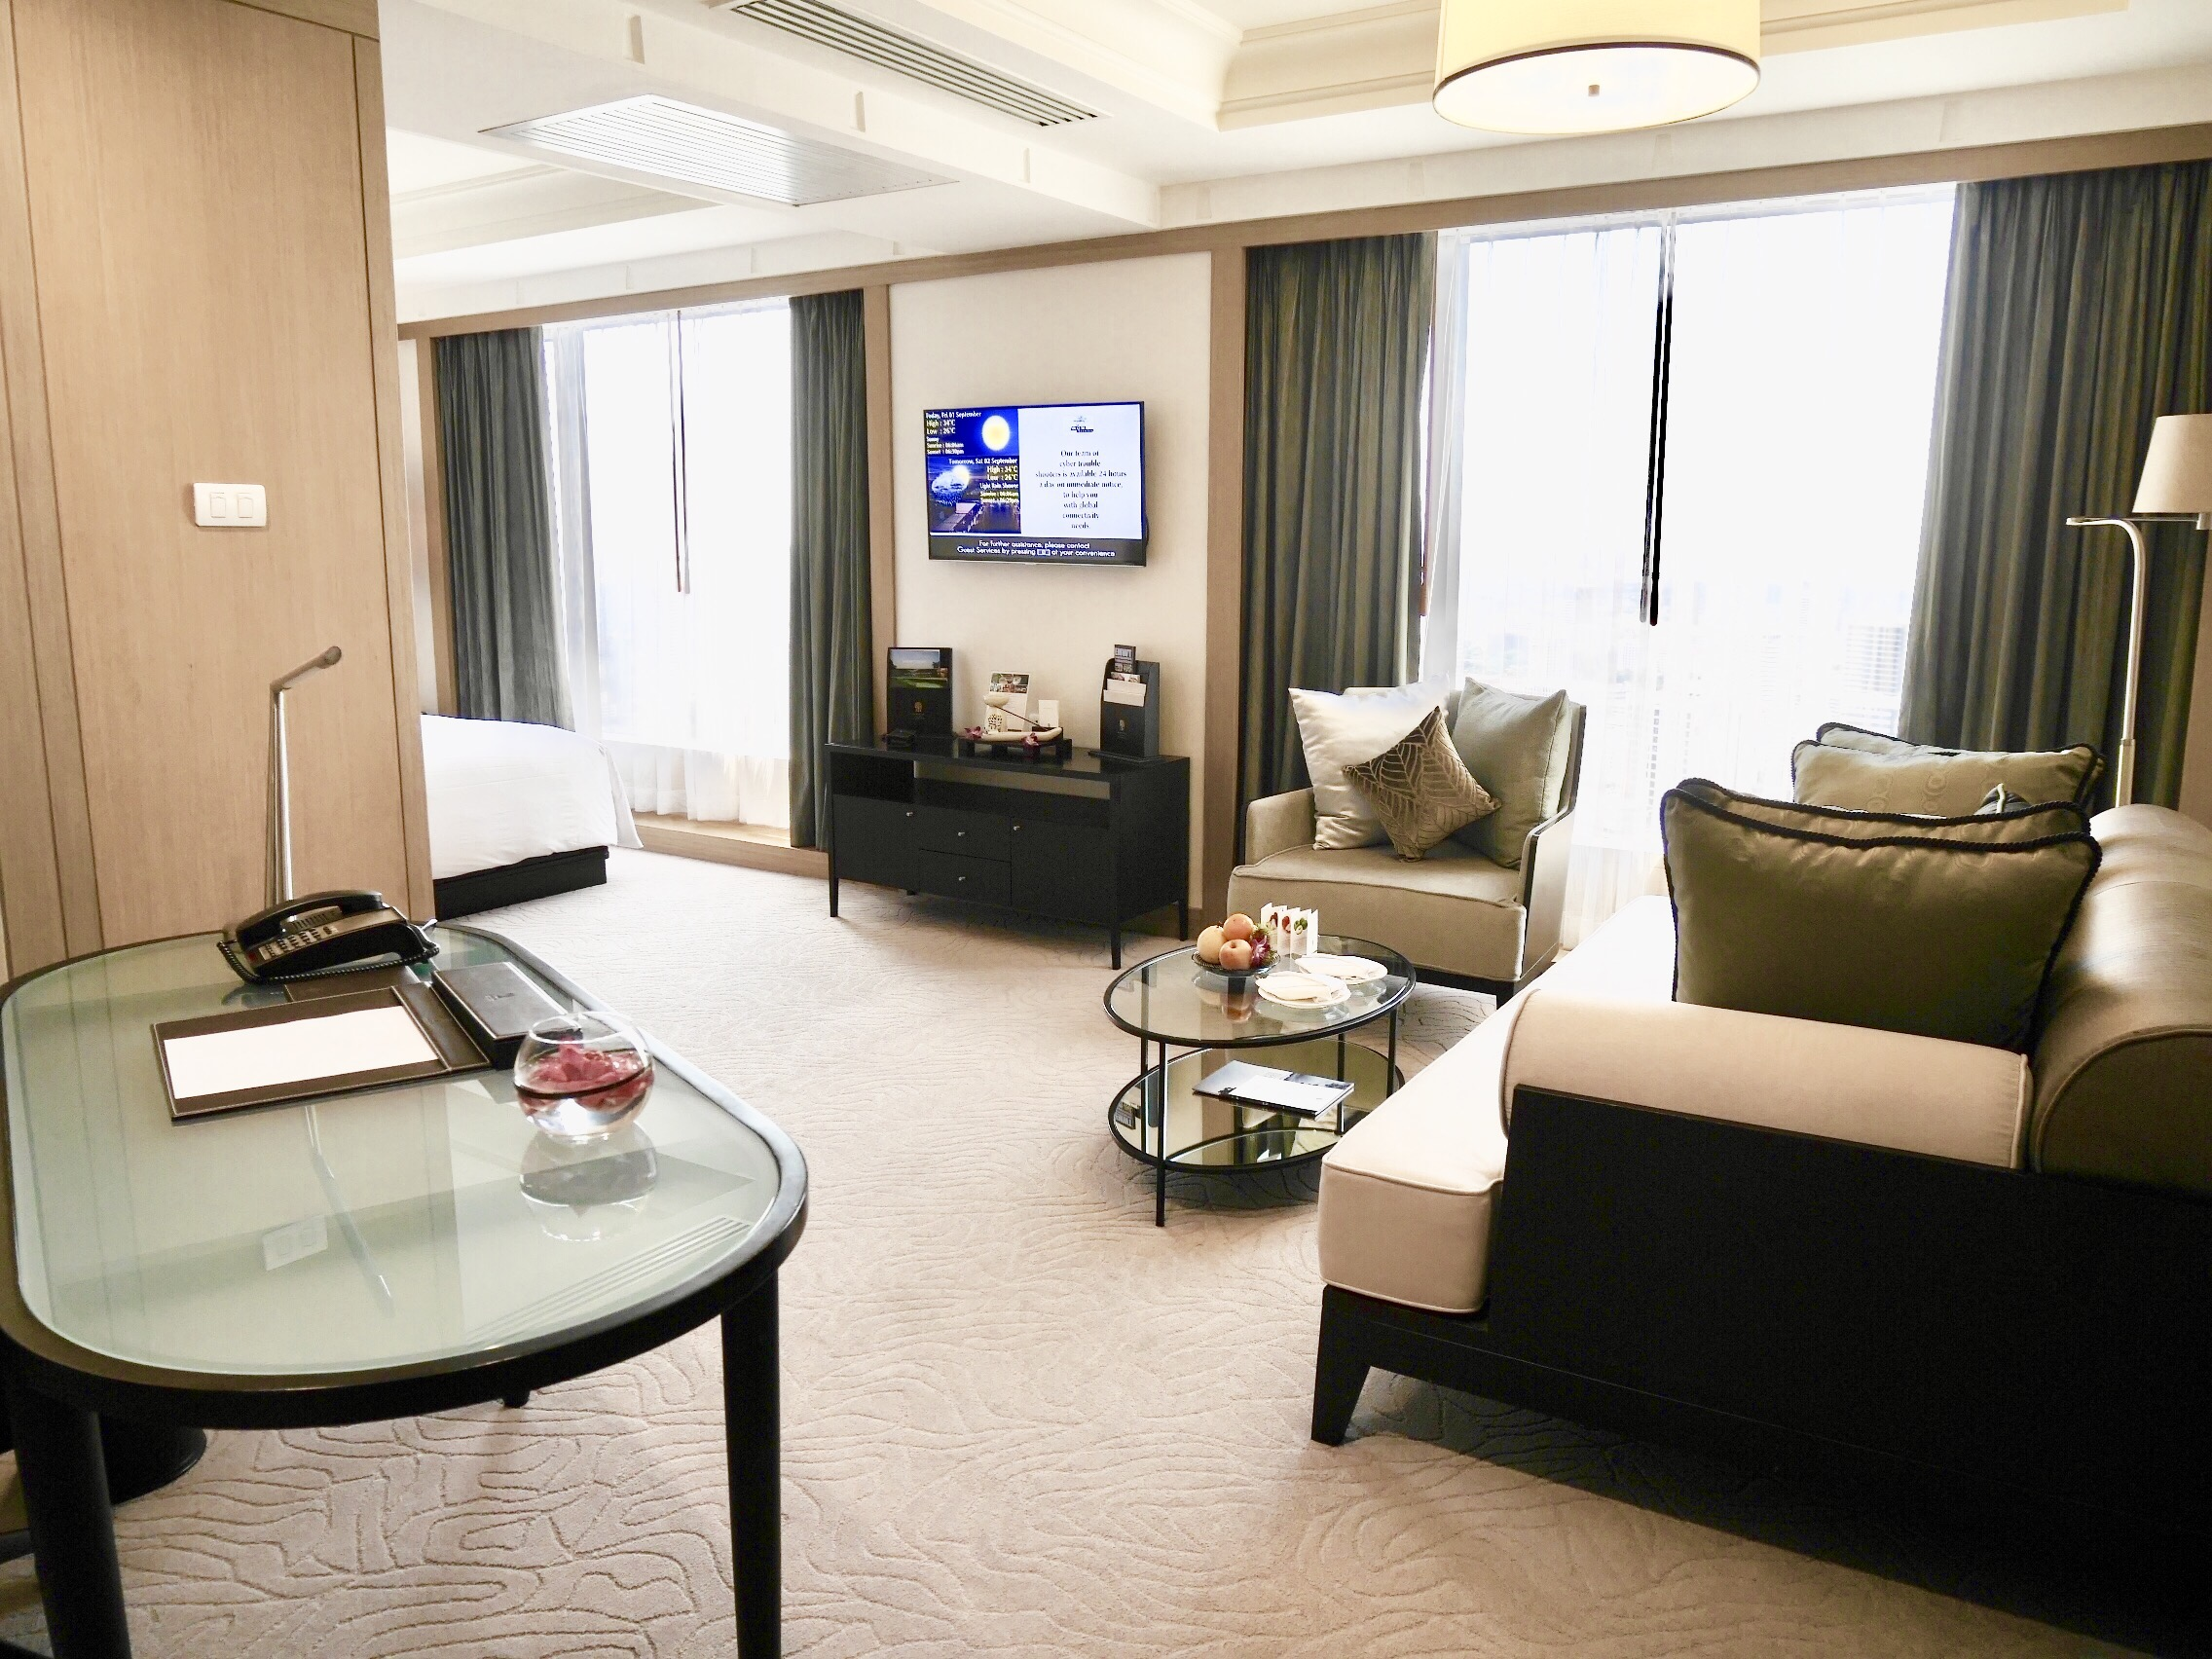 img 8199 - Banyan Tree Bangkok - 五つ星ホテルバンヤンツリーのSERENITY CLUBで過ごすリュクスな時間 「客室編」